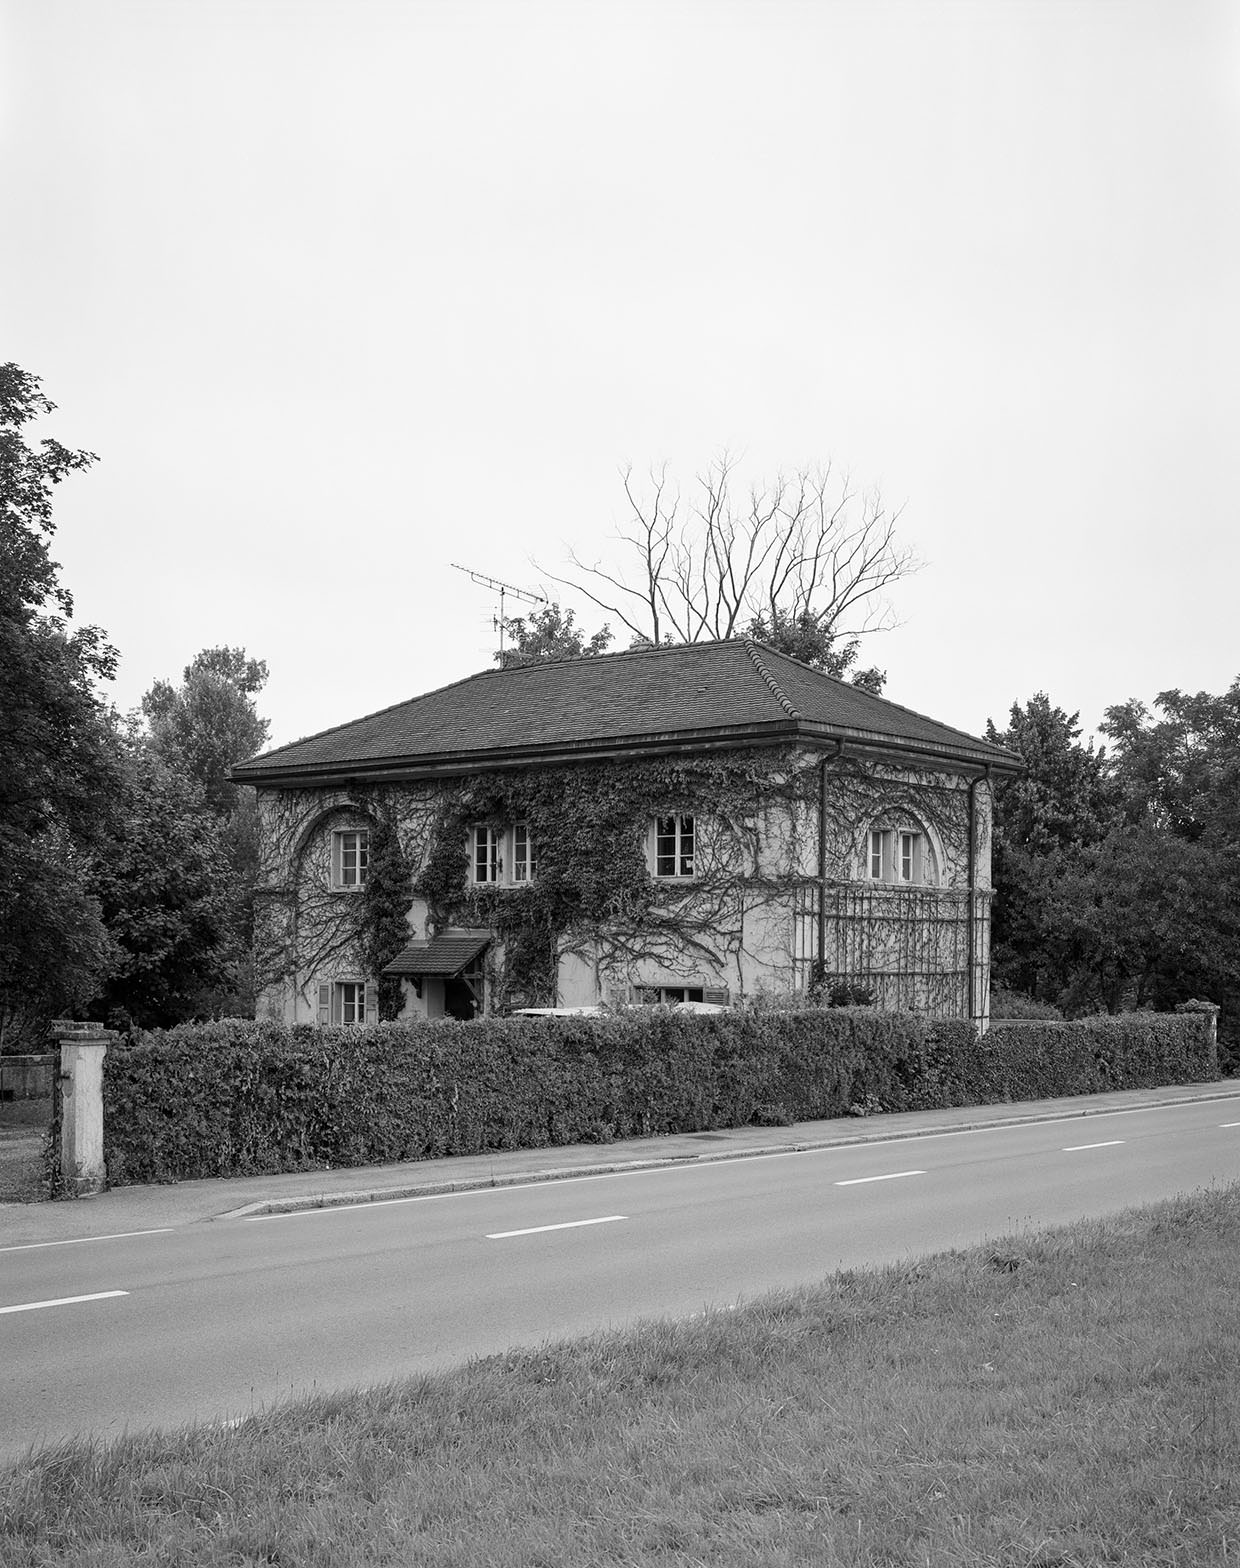 Das ehemalige Zollhaus in Faoug (VD) am Murtensee, 2005, Fotograf: Dominique Uldry ©Bern: Dominique Uldry